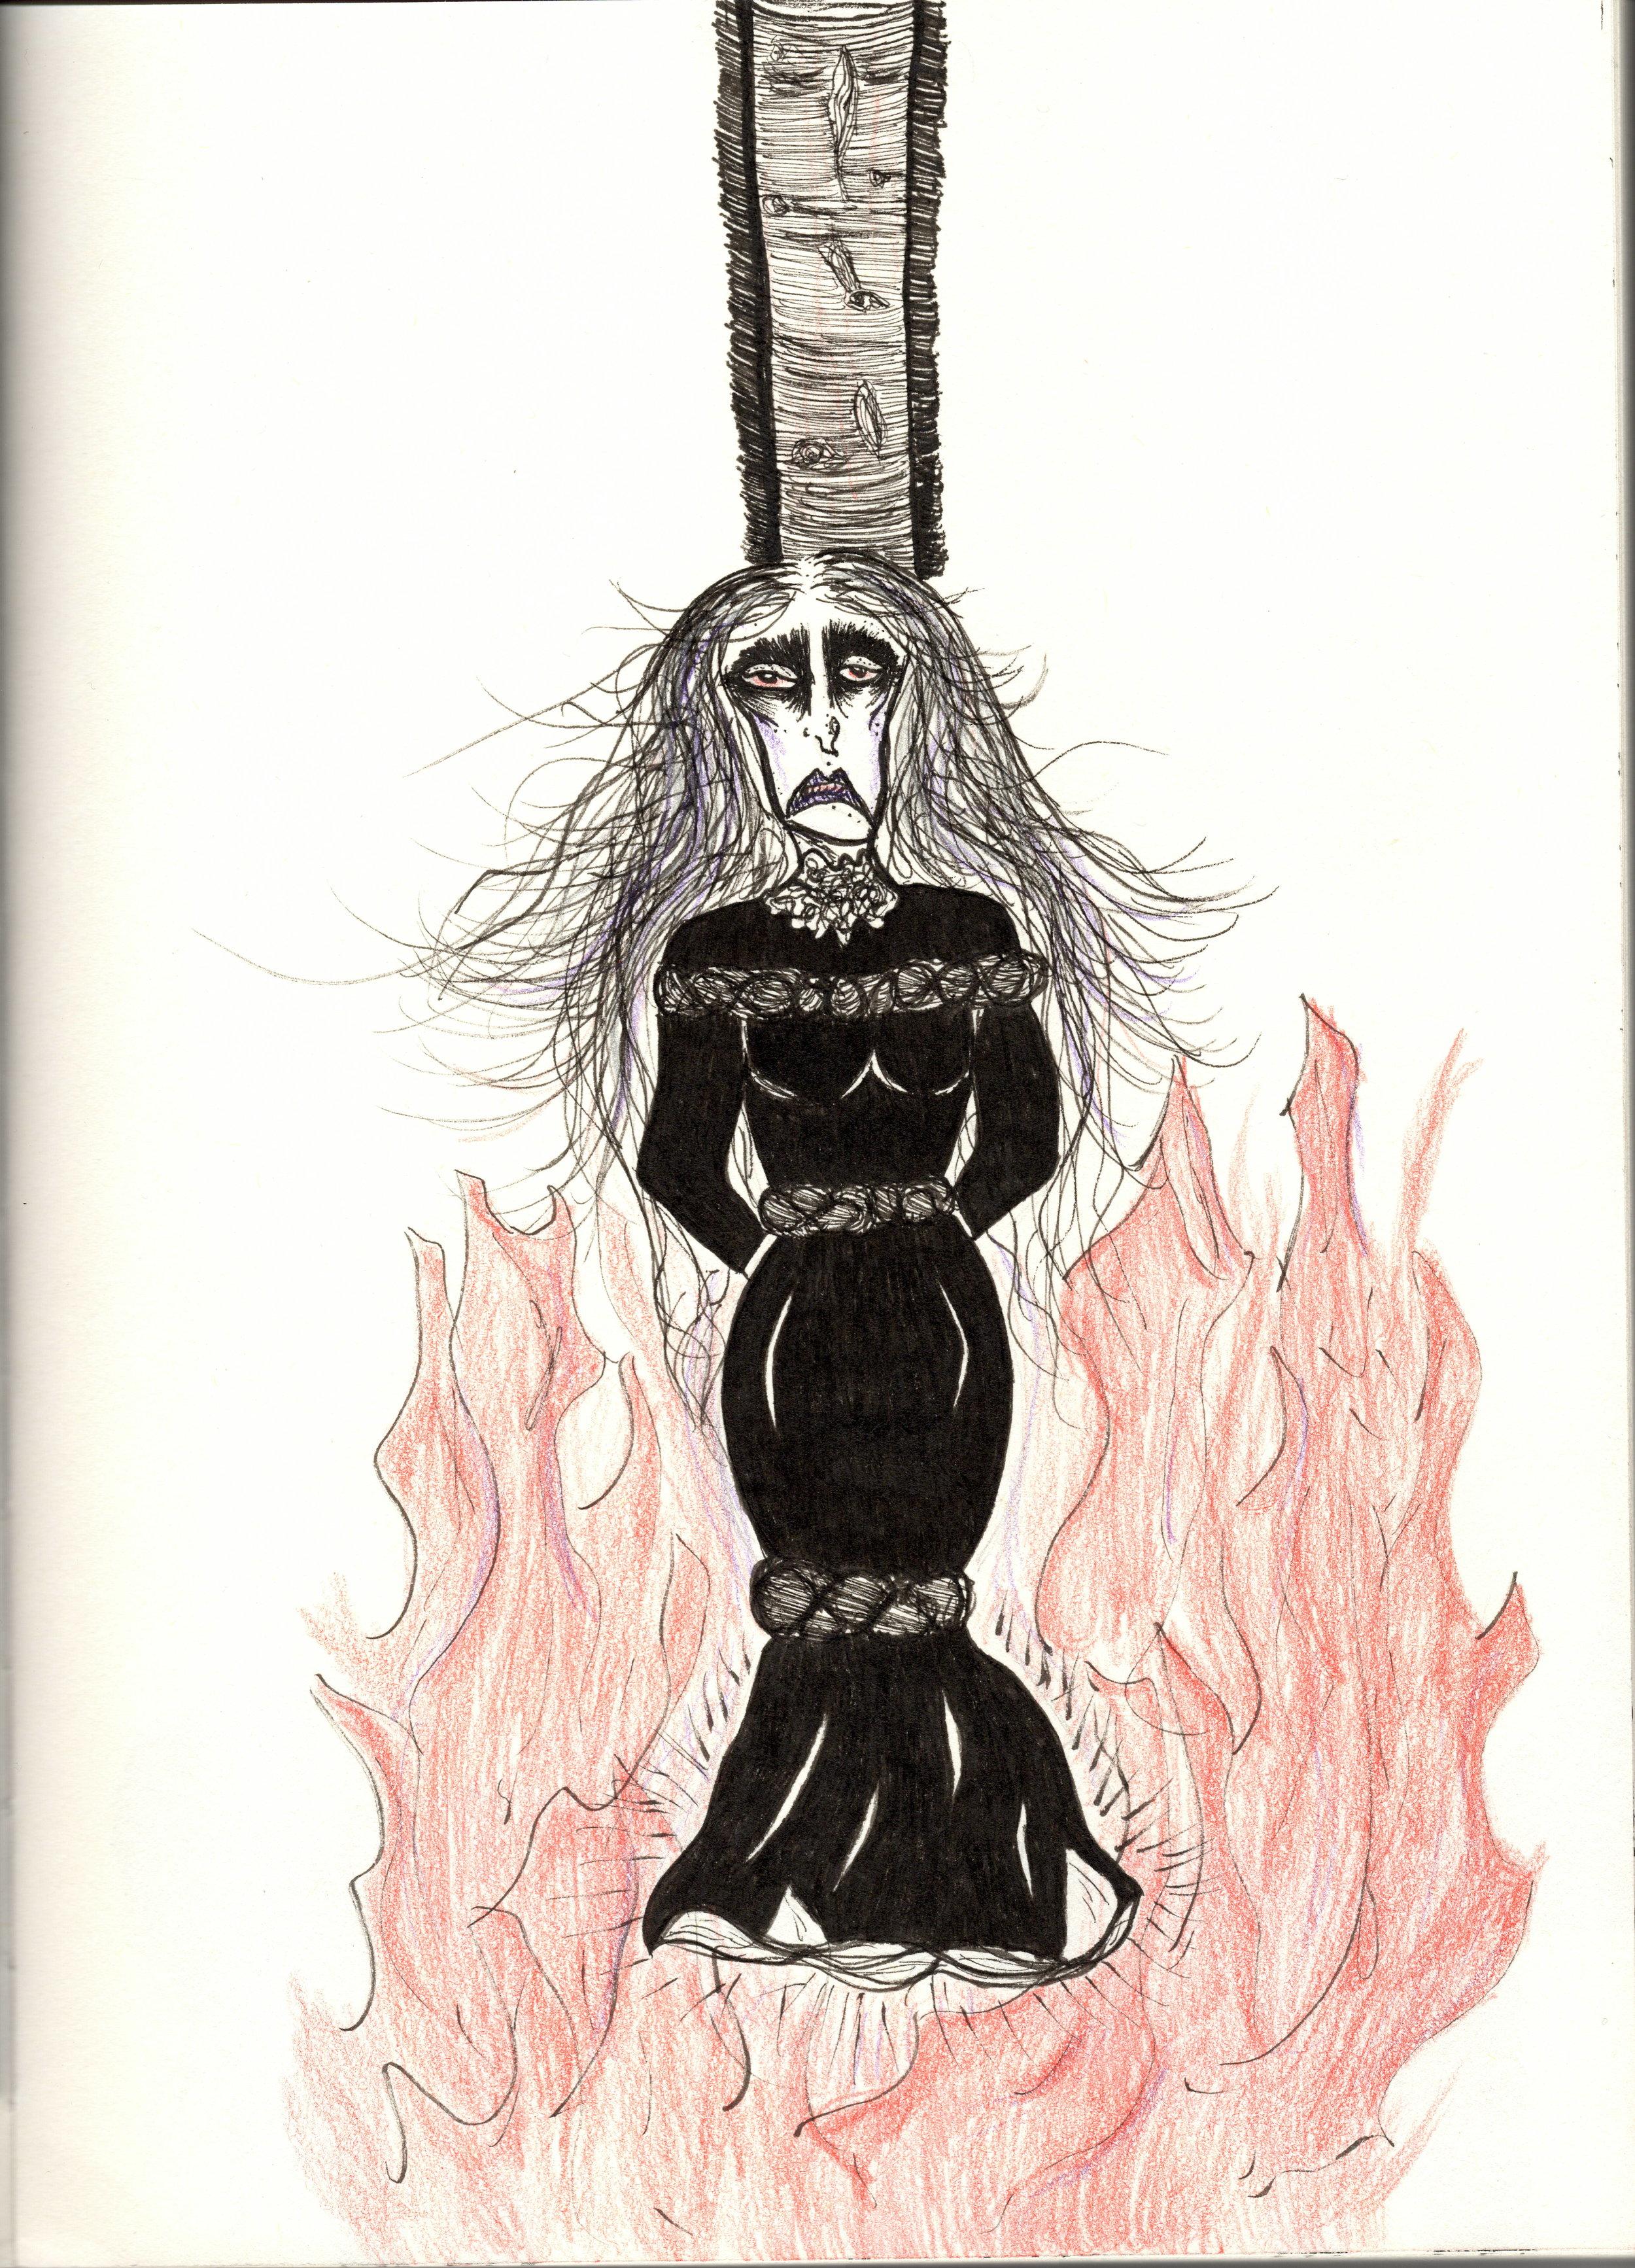 Witch Hunt: Burn that Bitch